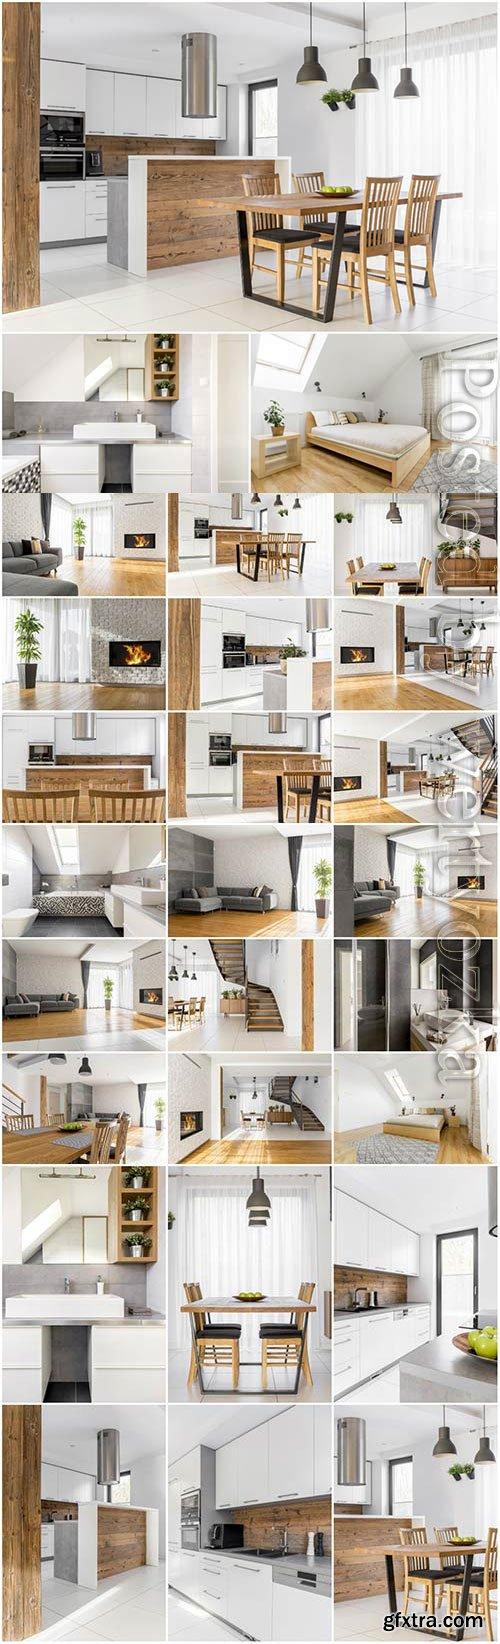 Kitchen and bedroom interior stock photo